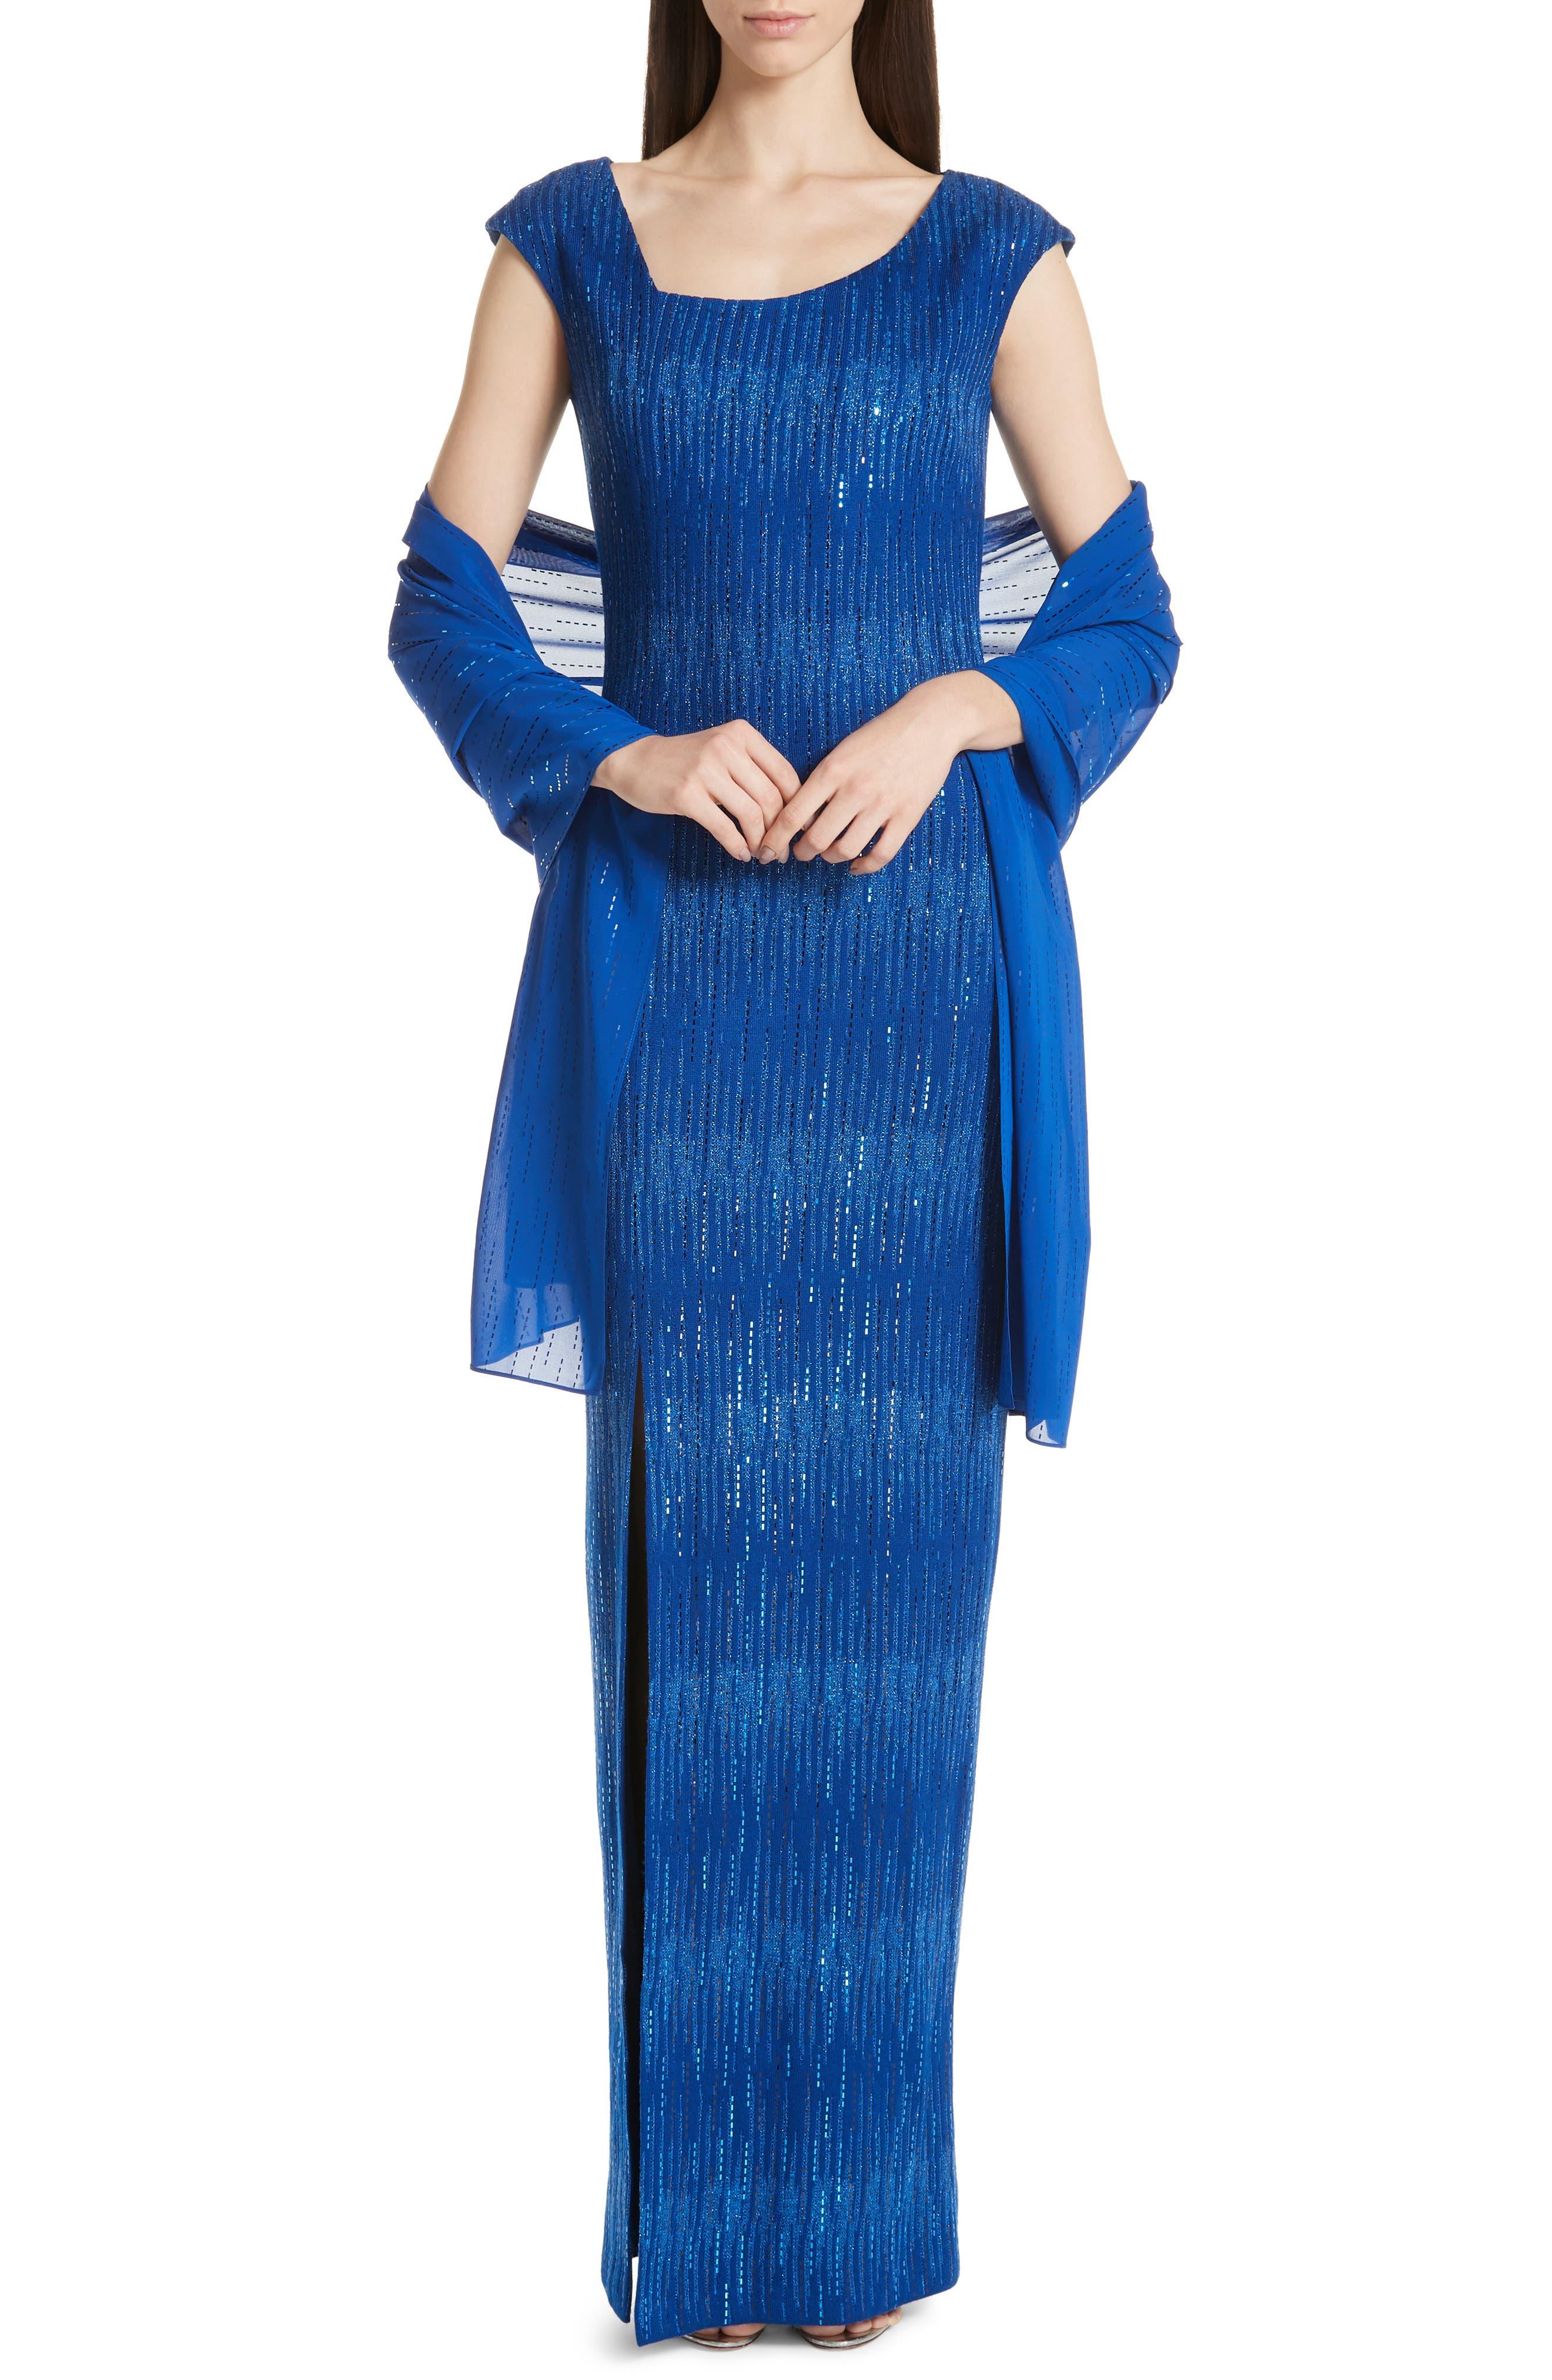 ST. JOHN COLLECTION, Asymmetrical Neck Carrie Knit Evening Dress, Alternate thumbnail 7, color, AZUL